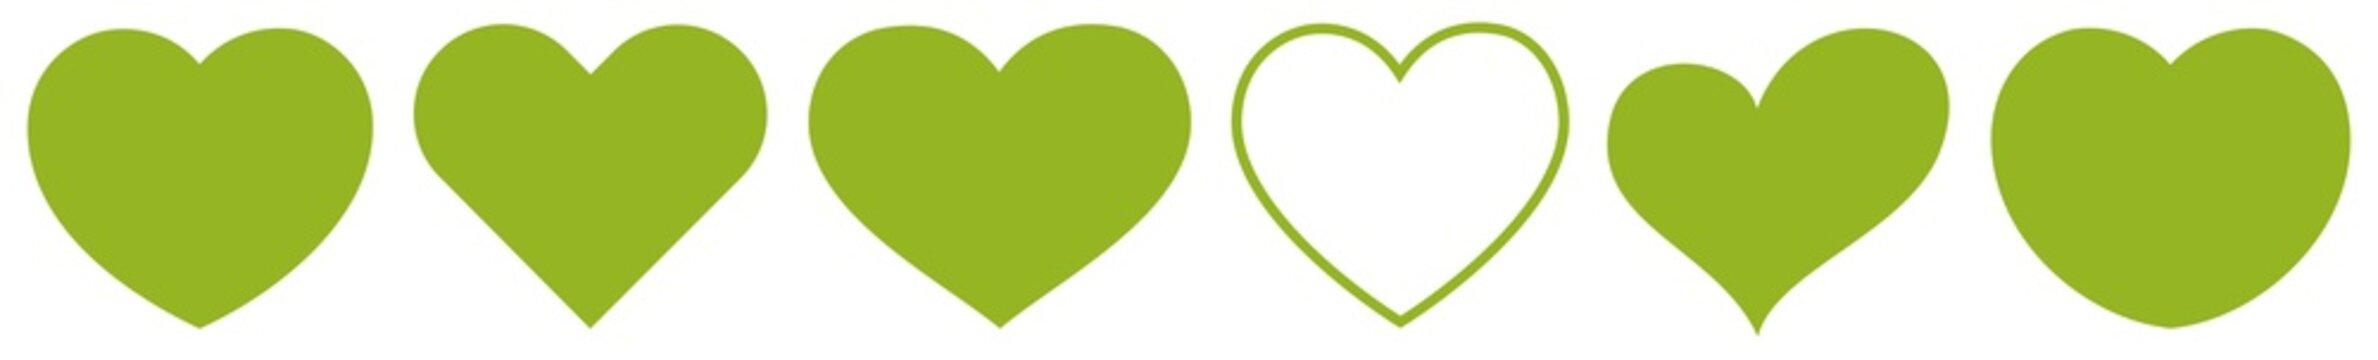 Heart Green | Eco | Nature | Love | Logo | Variations